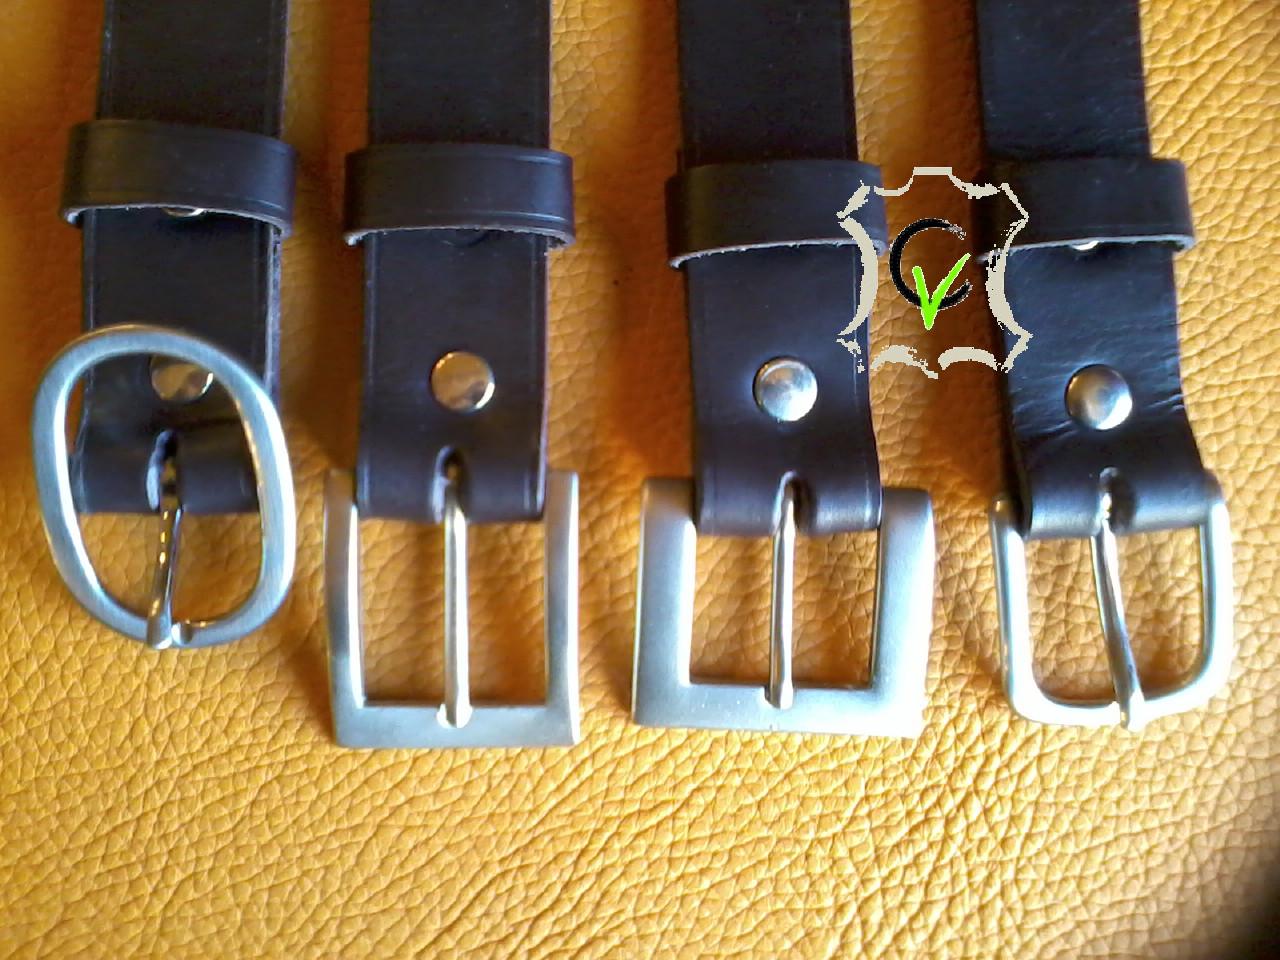 ceintures en cuir tannage végétal brun 30mm